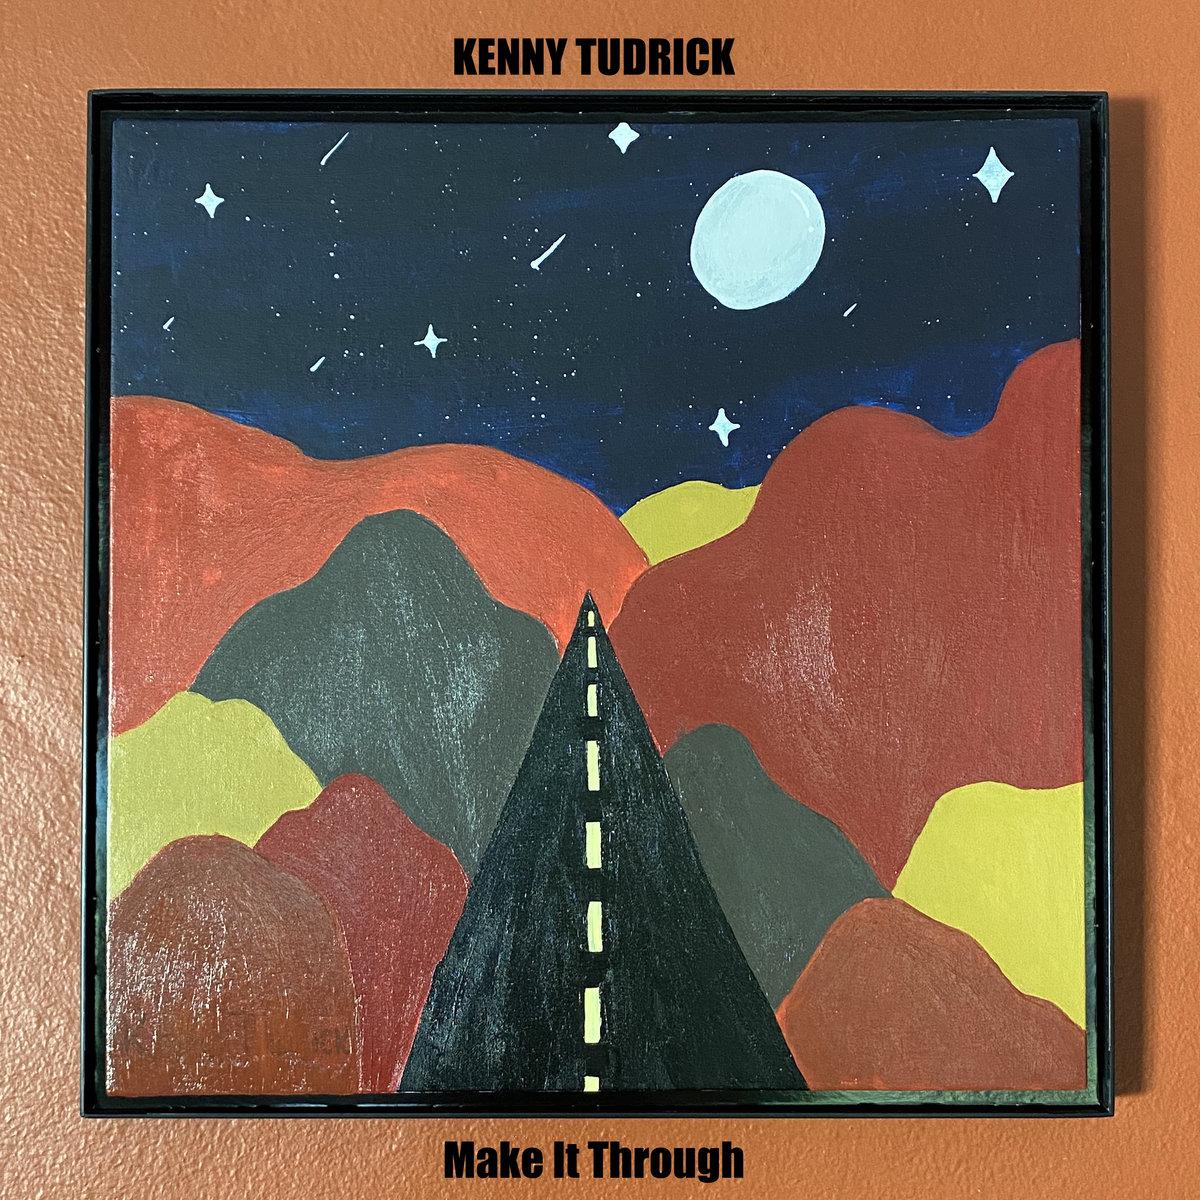 Make It Through by Kenny Tudrick